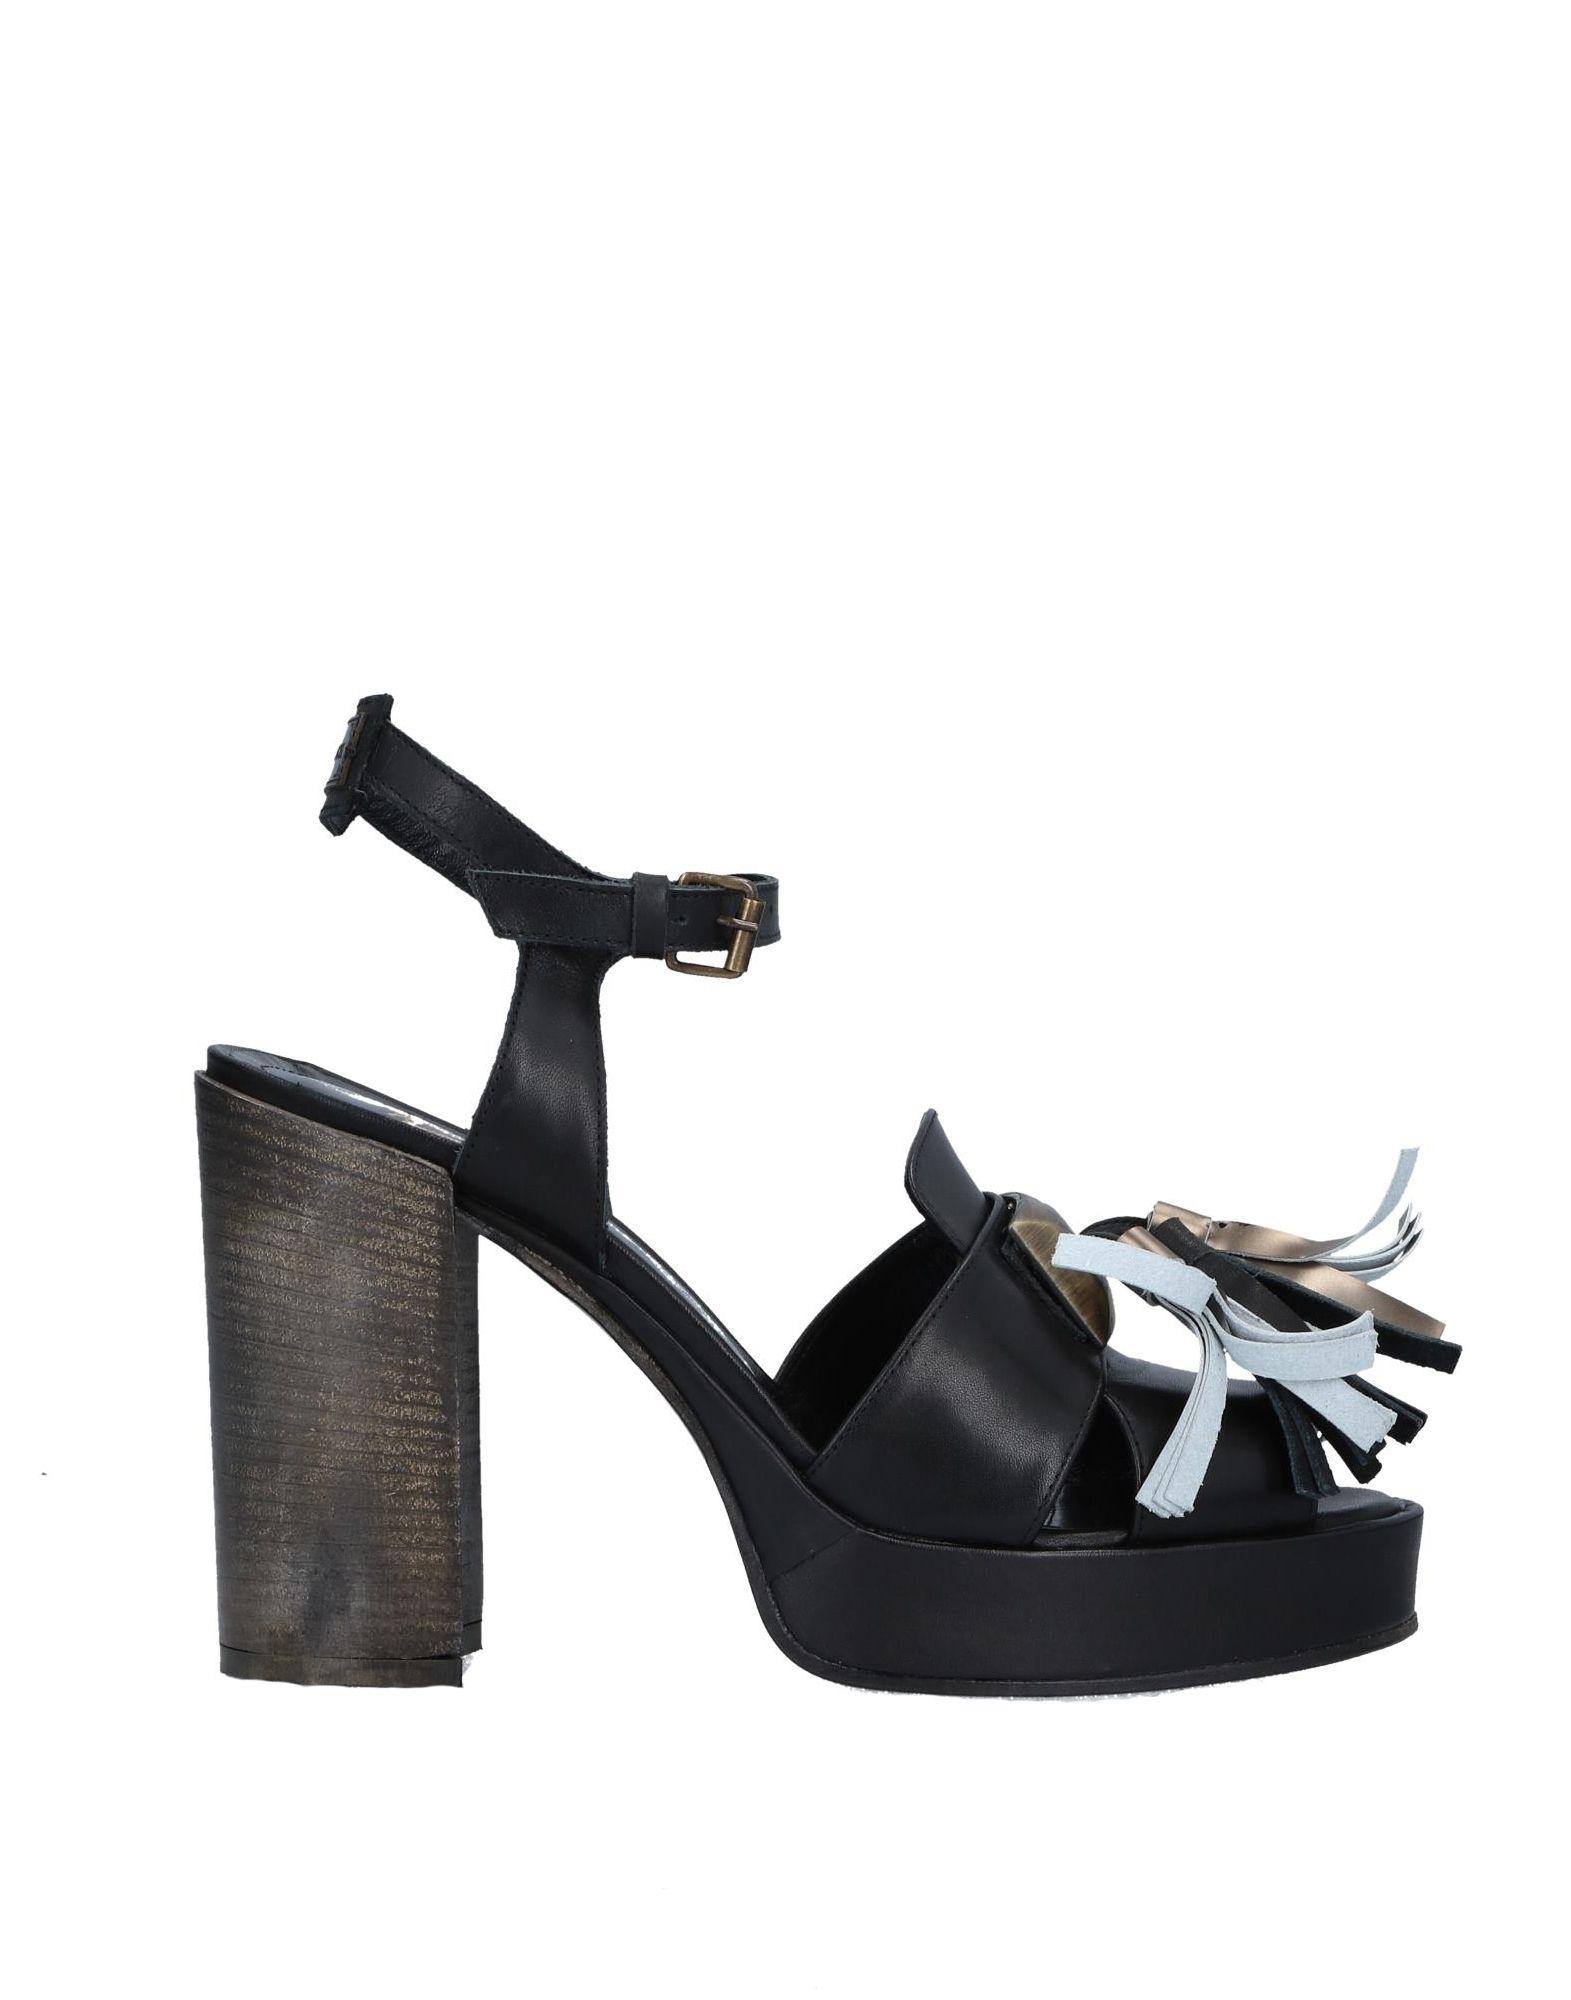 LE RUEMARCEL Sandals in Black